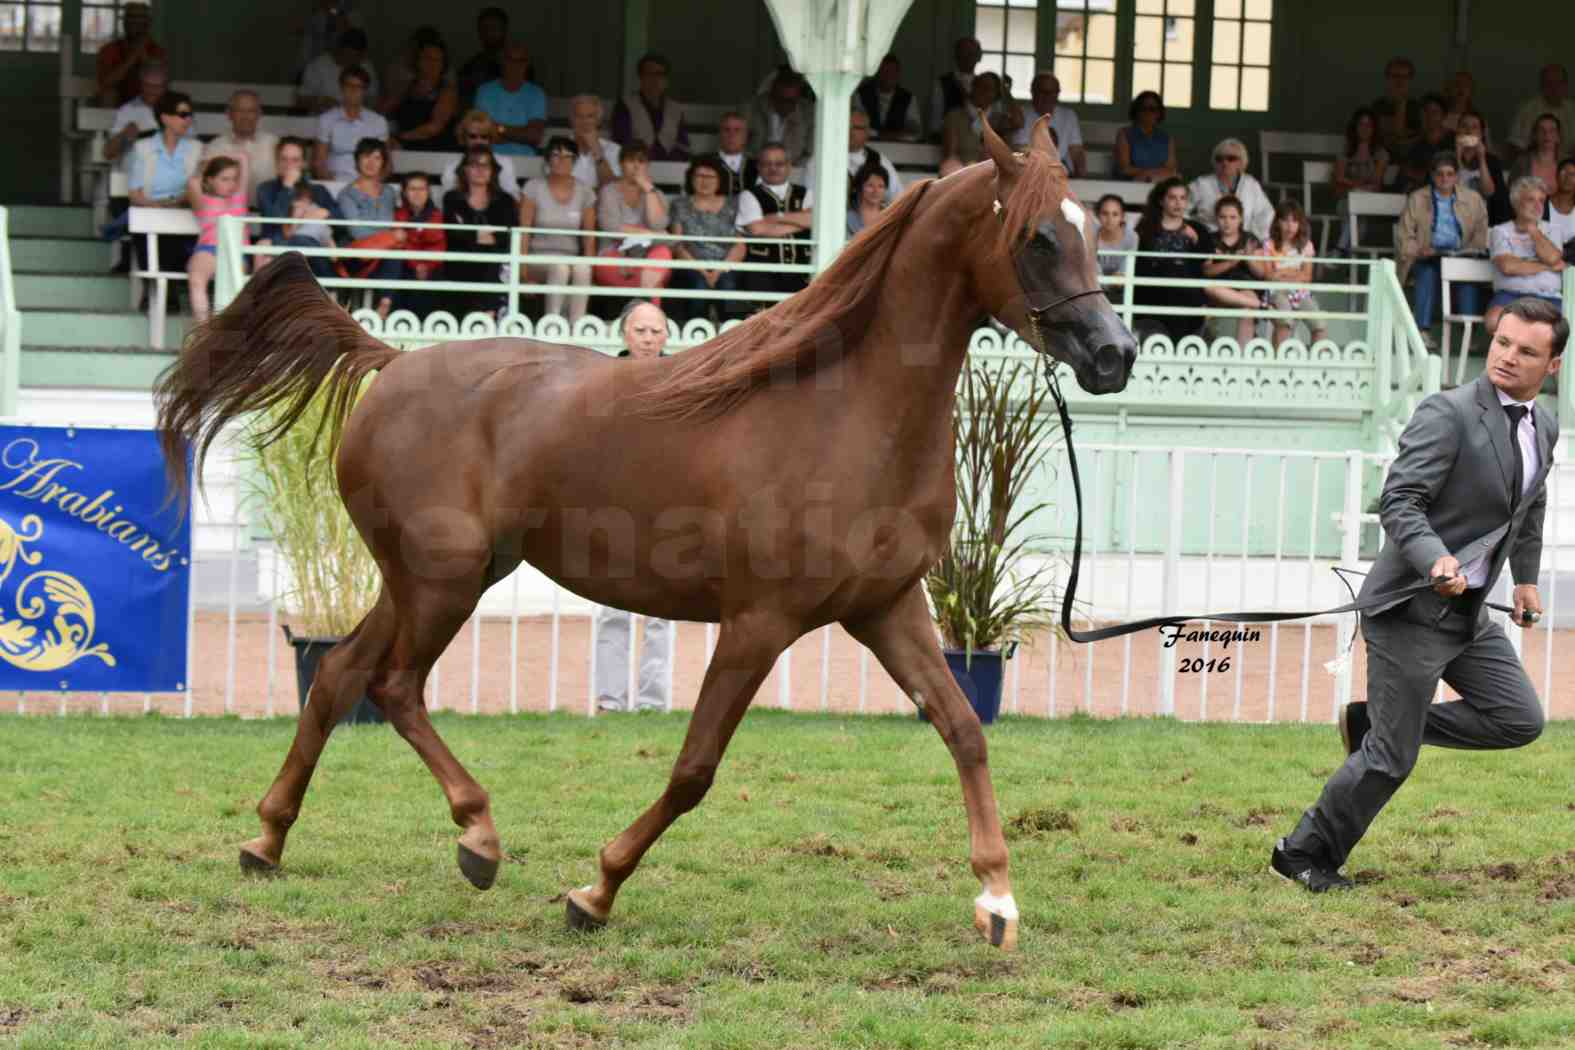 International Arabian Horse Show B de VICHY 2016 - PEARL DE DJOON - Notre Sélection - 13